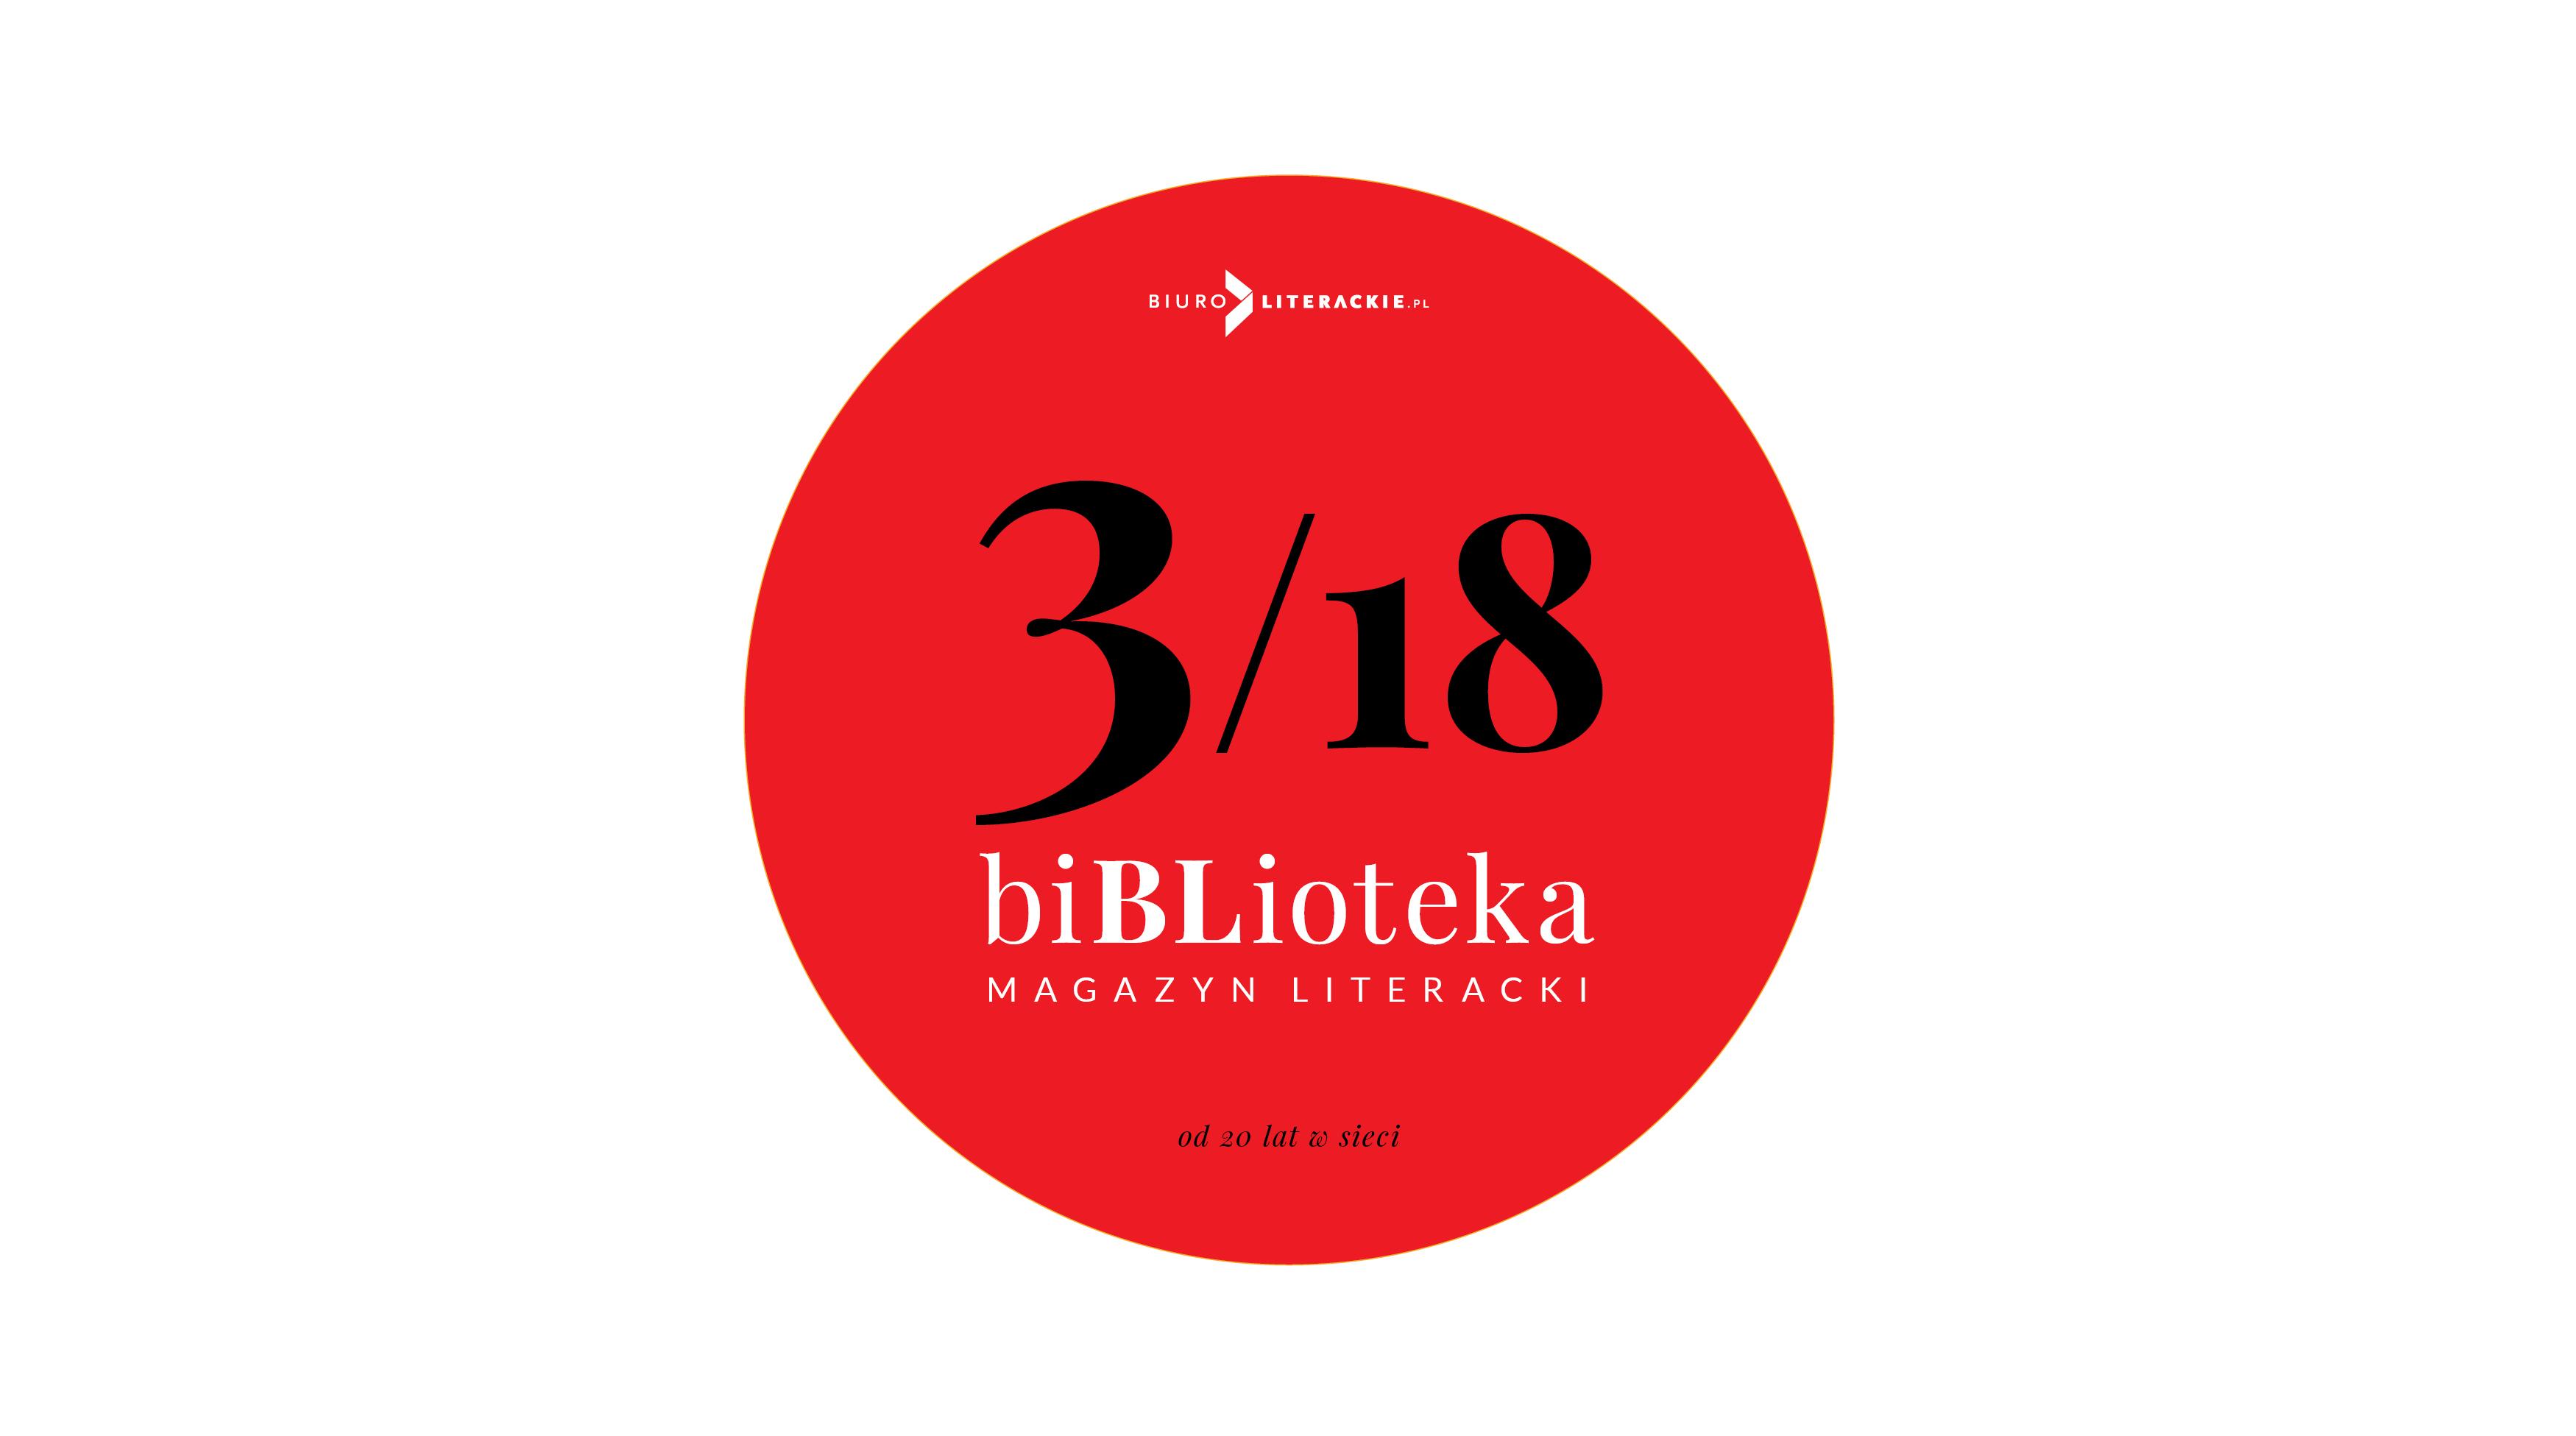 BL Img 2018.02.28 biBLioteka nr 3__www_top